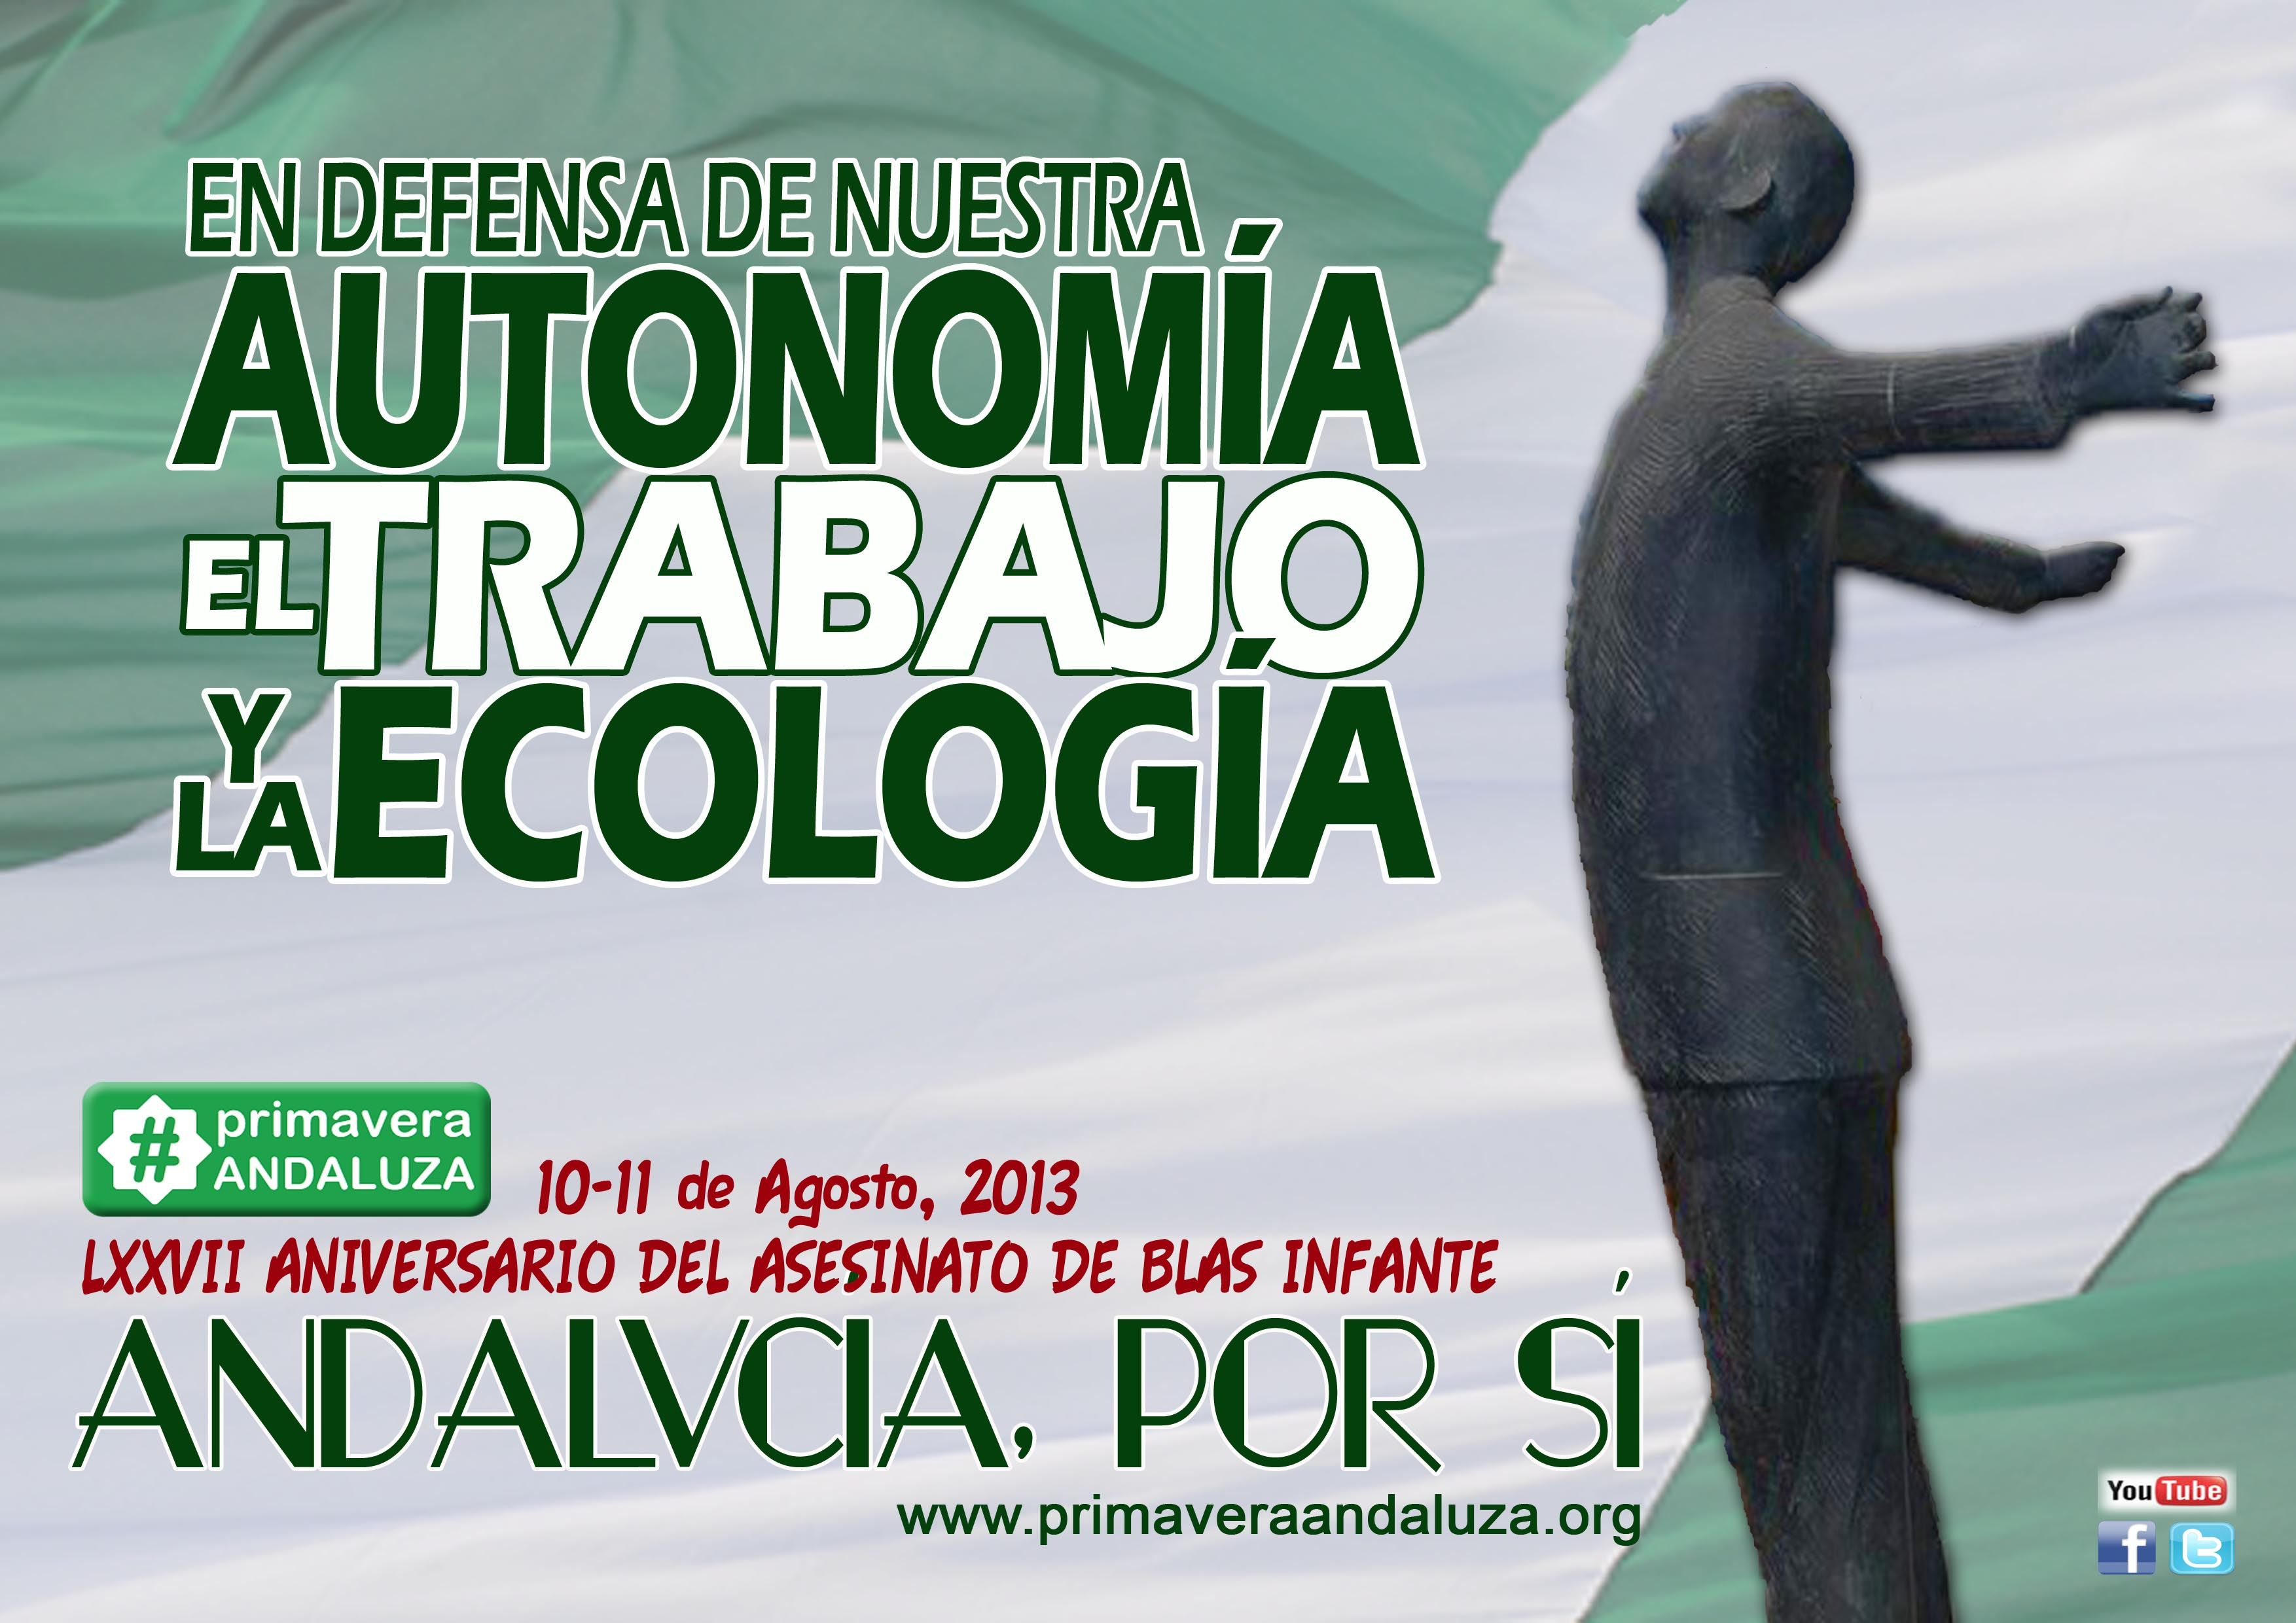 77 aniversario Blas Infante Primavera Andaluza